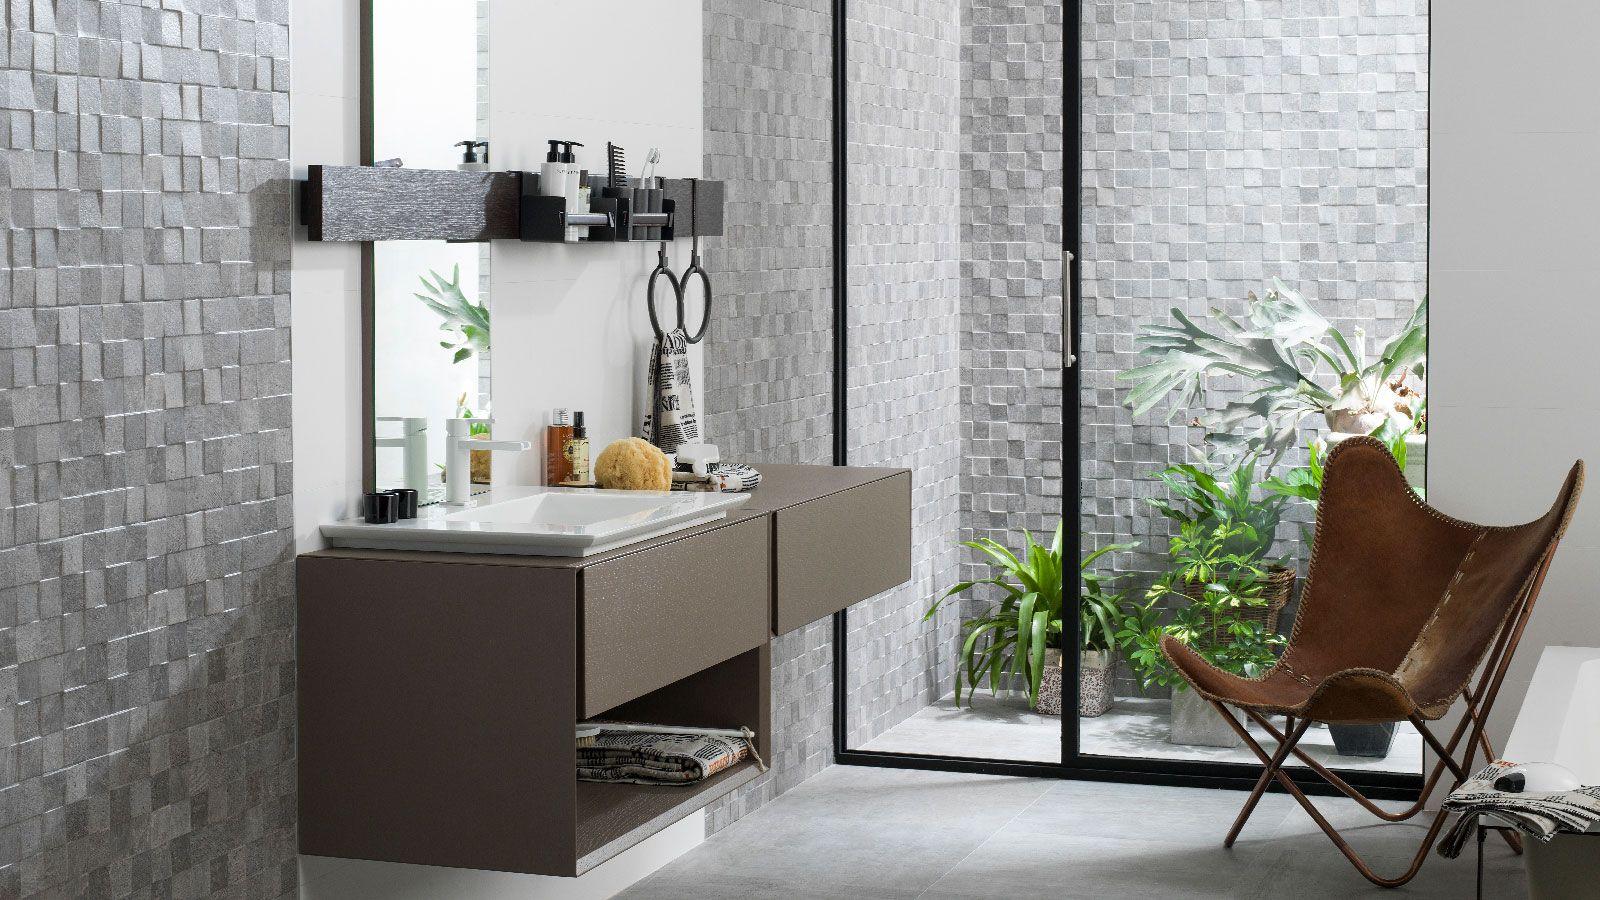 Mosaic Rodano By Porcelanosa Walltiles In Steel And Stone Interiordesign Rustic Bathroom Mirrors Home Decor Inexpensive Decor